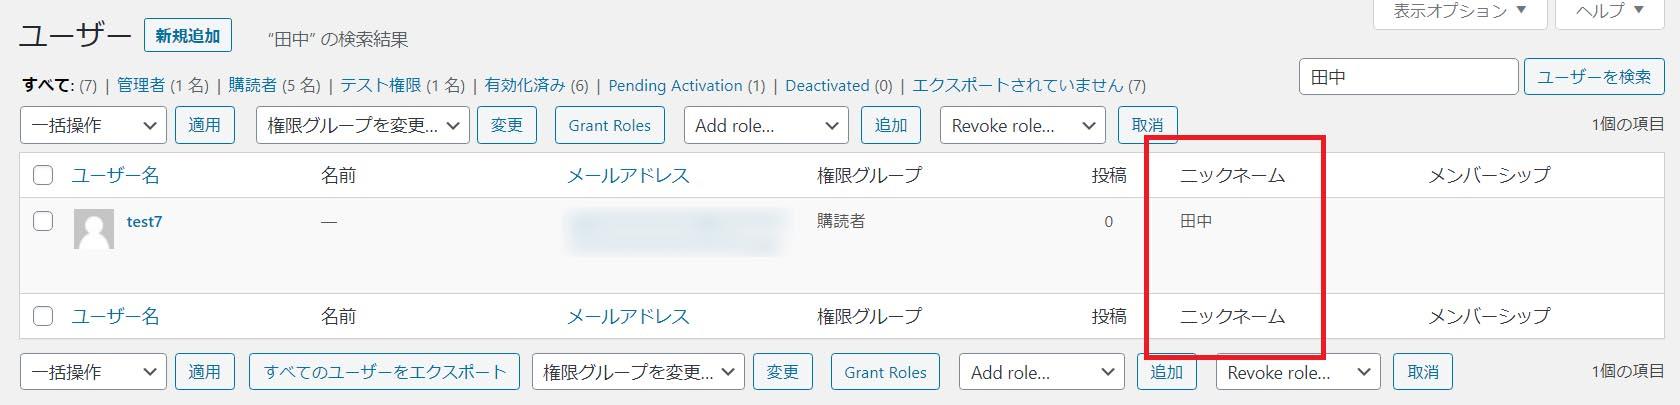 WP-Membersのフィールドの編集(ユーザー画面)